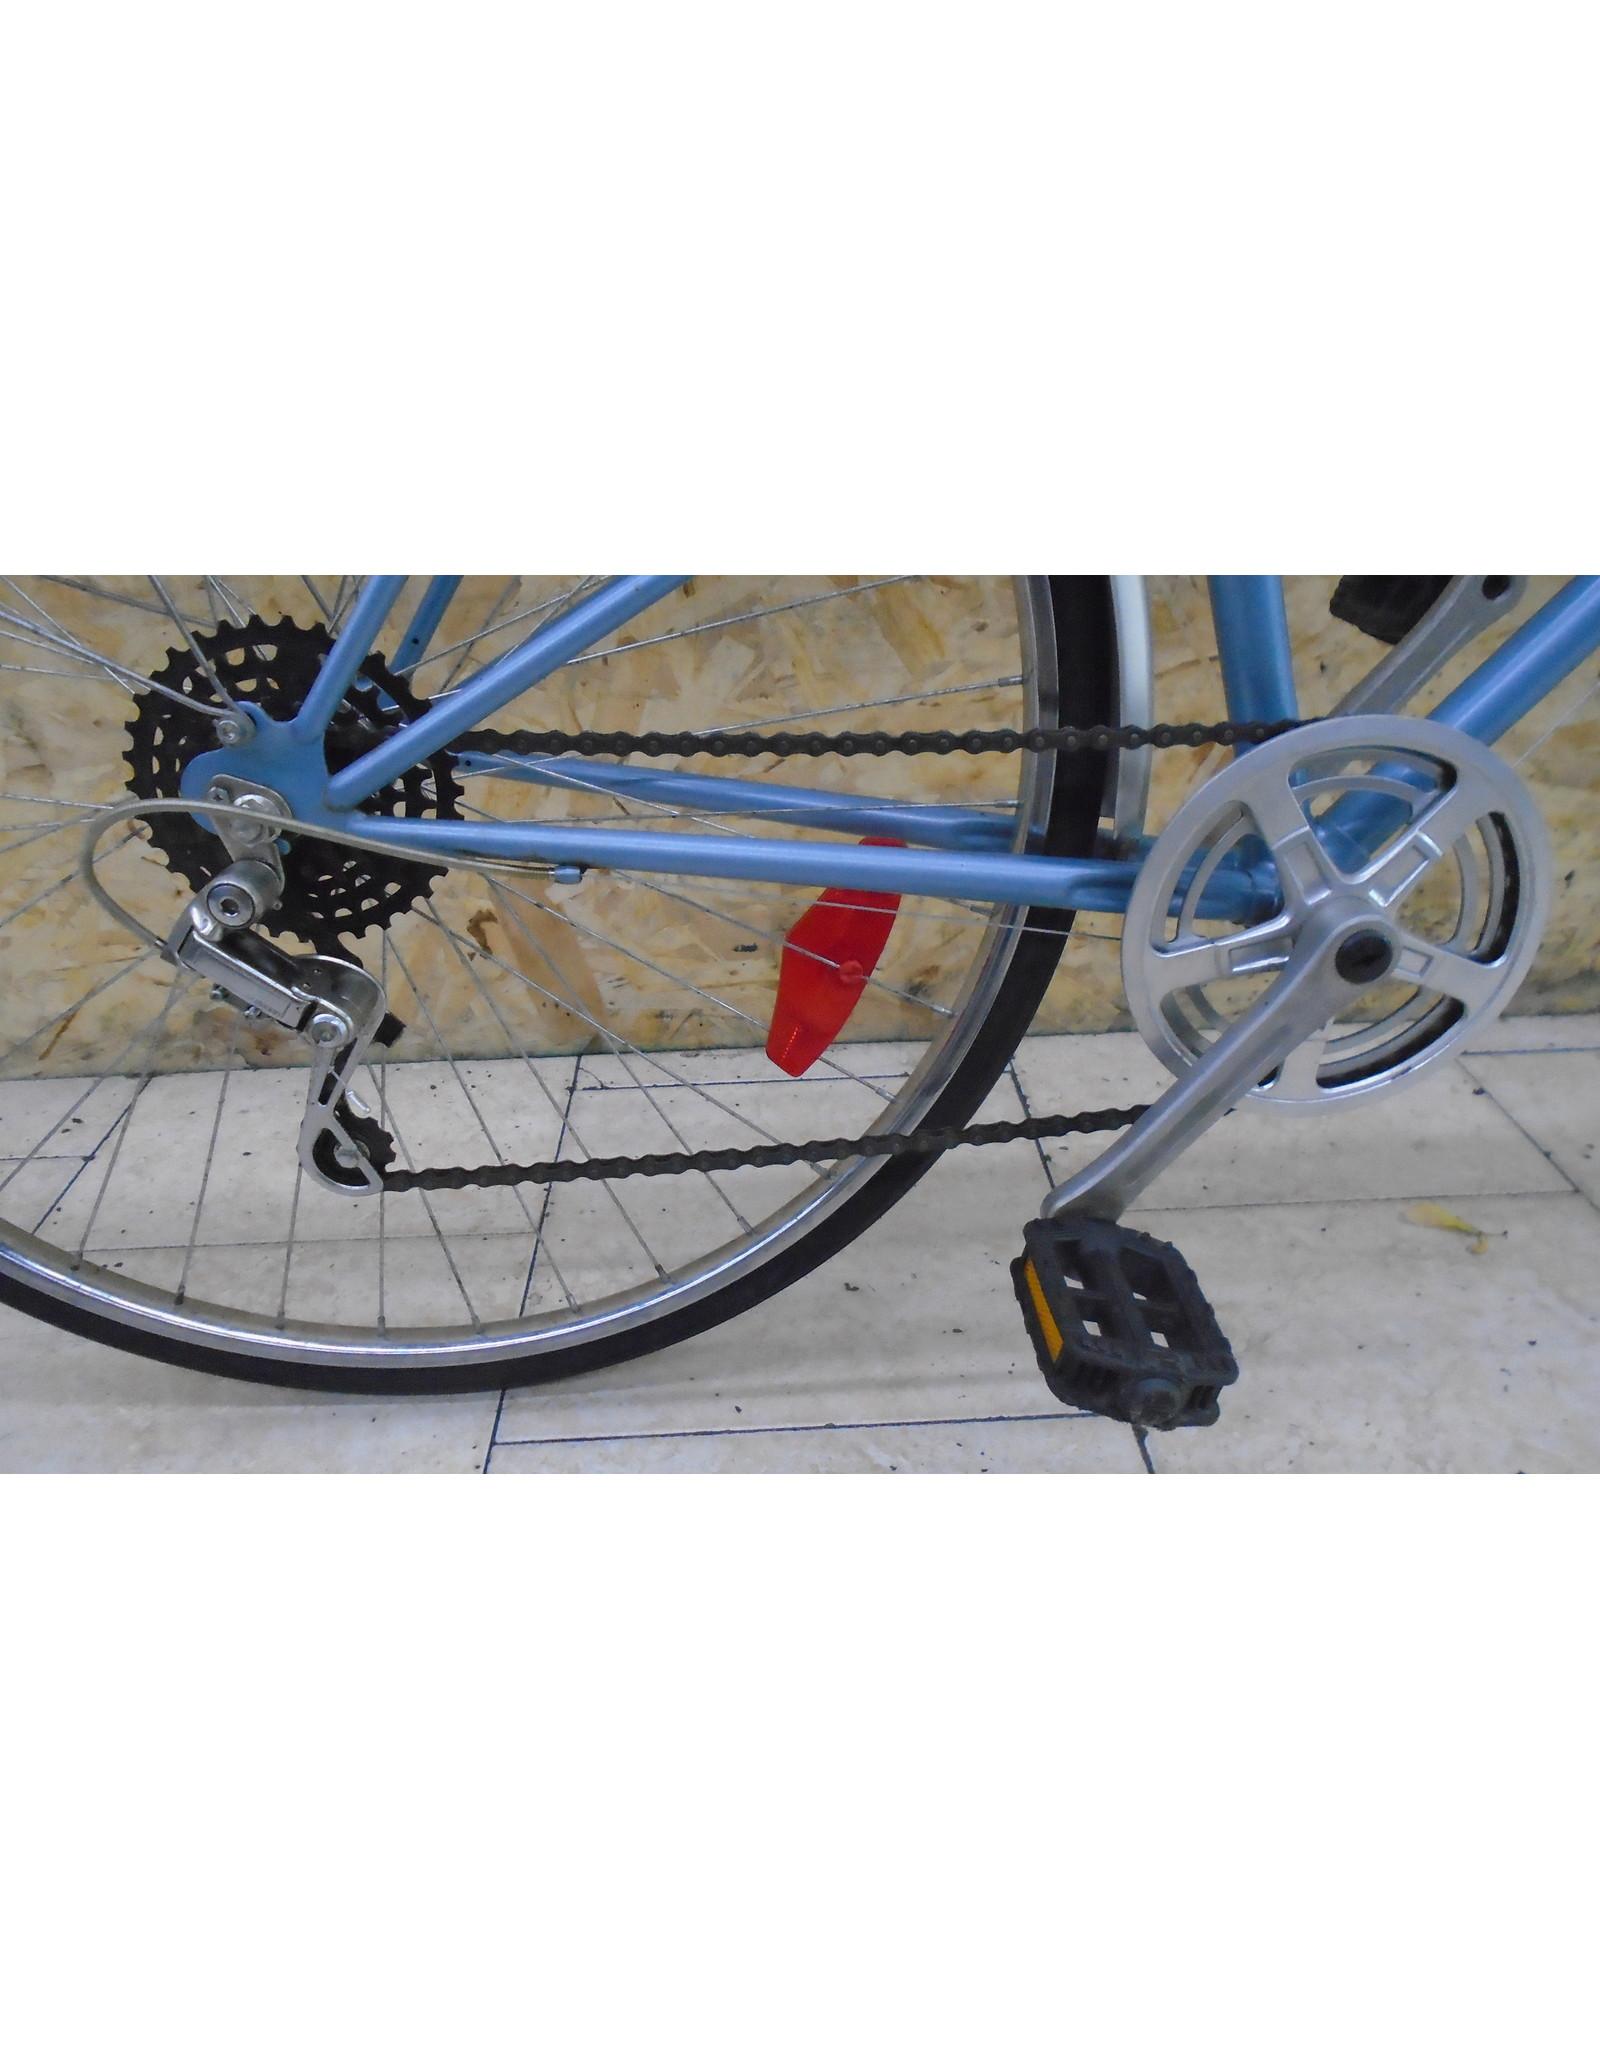 "Vélo usagé de ville Velosport 21"" - 10771"